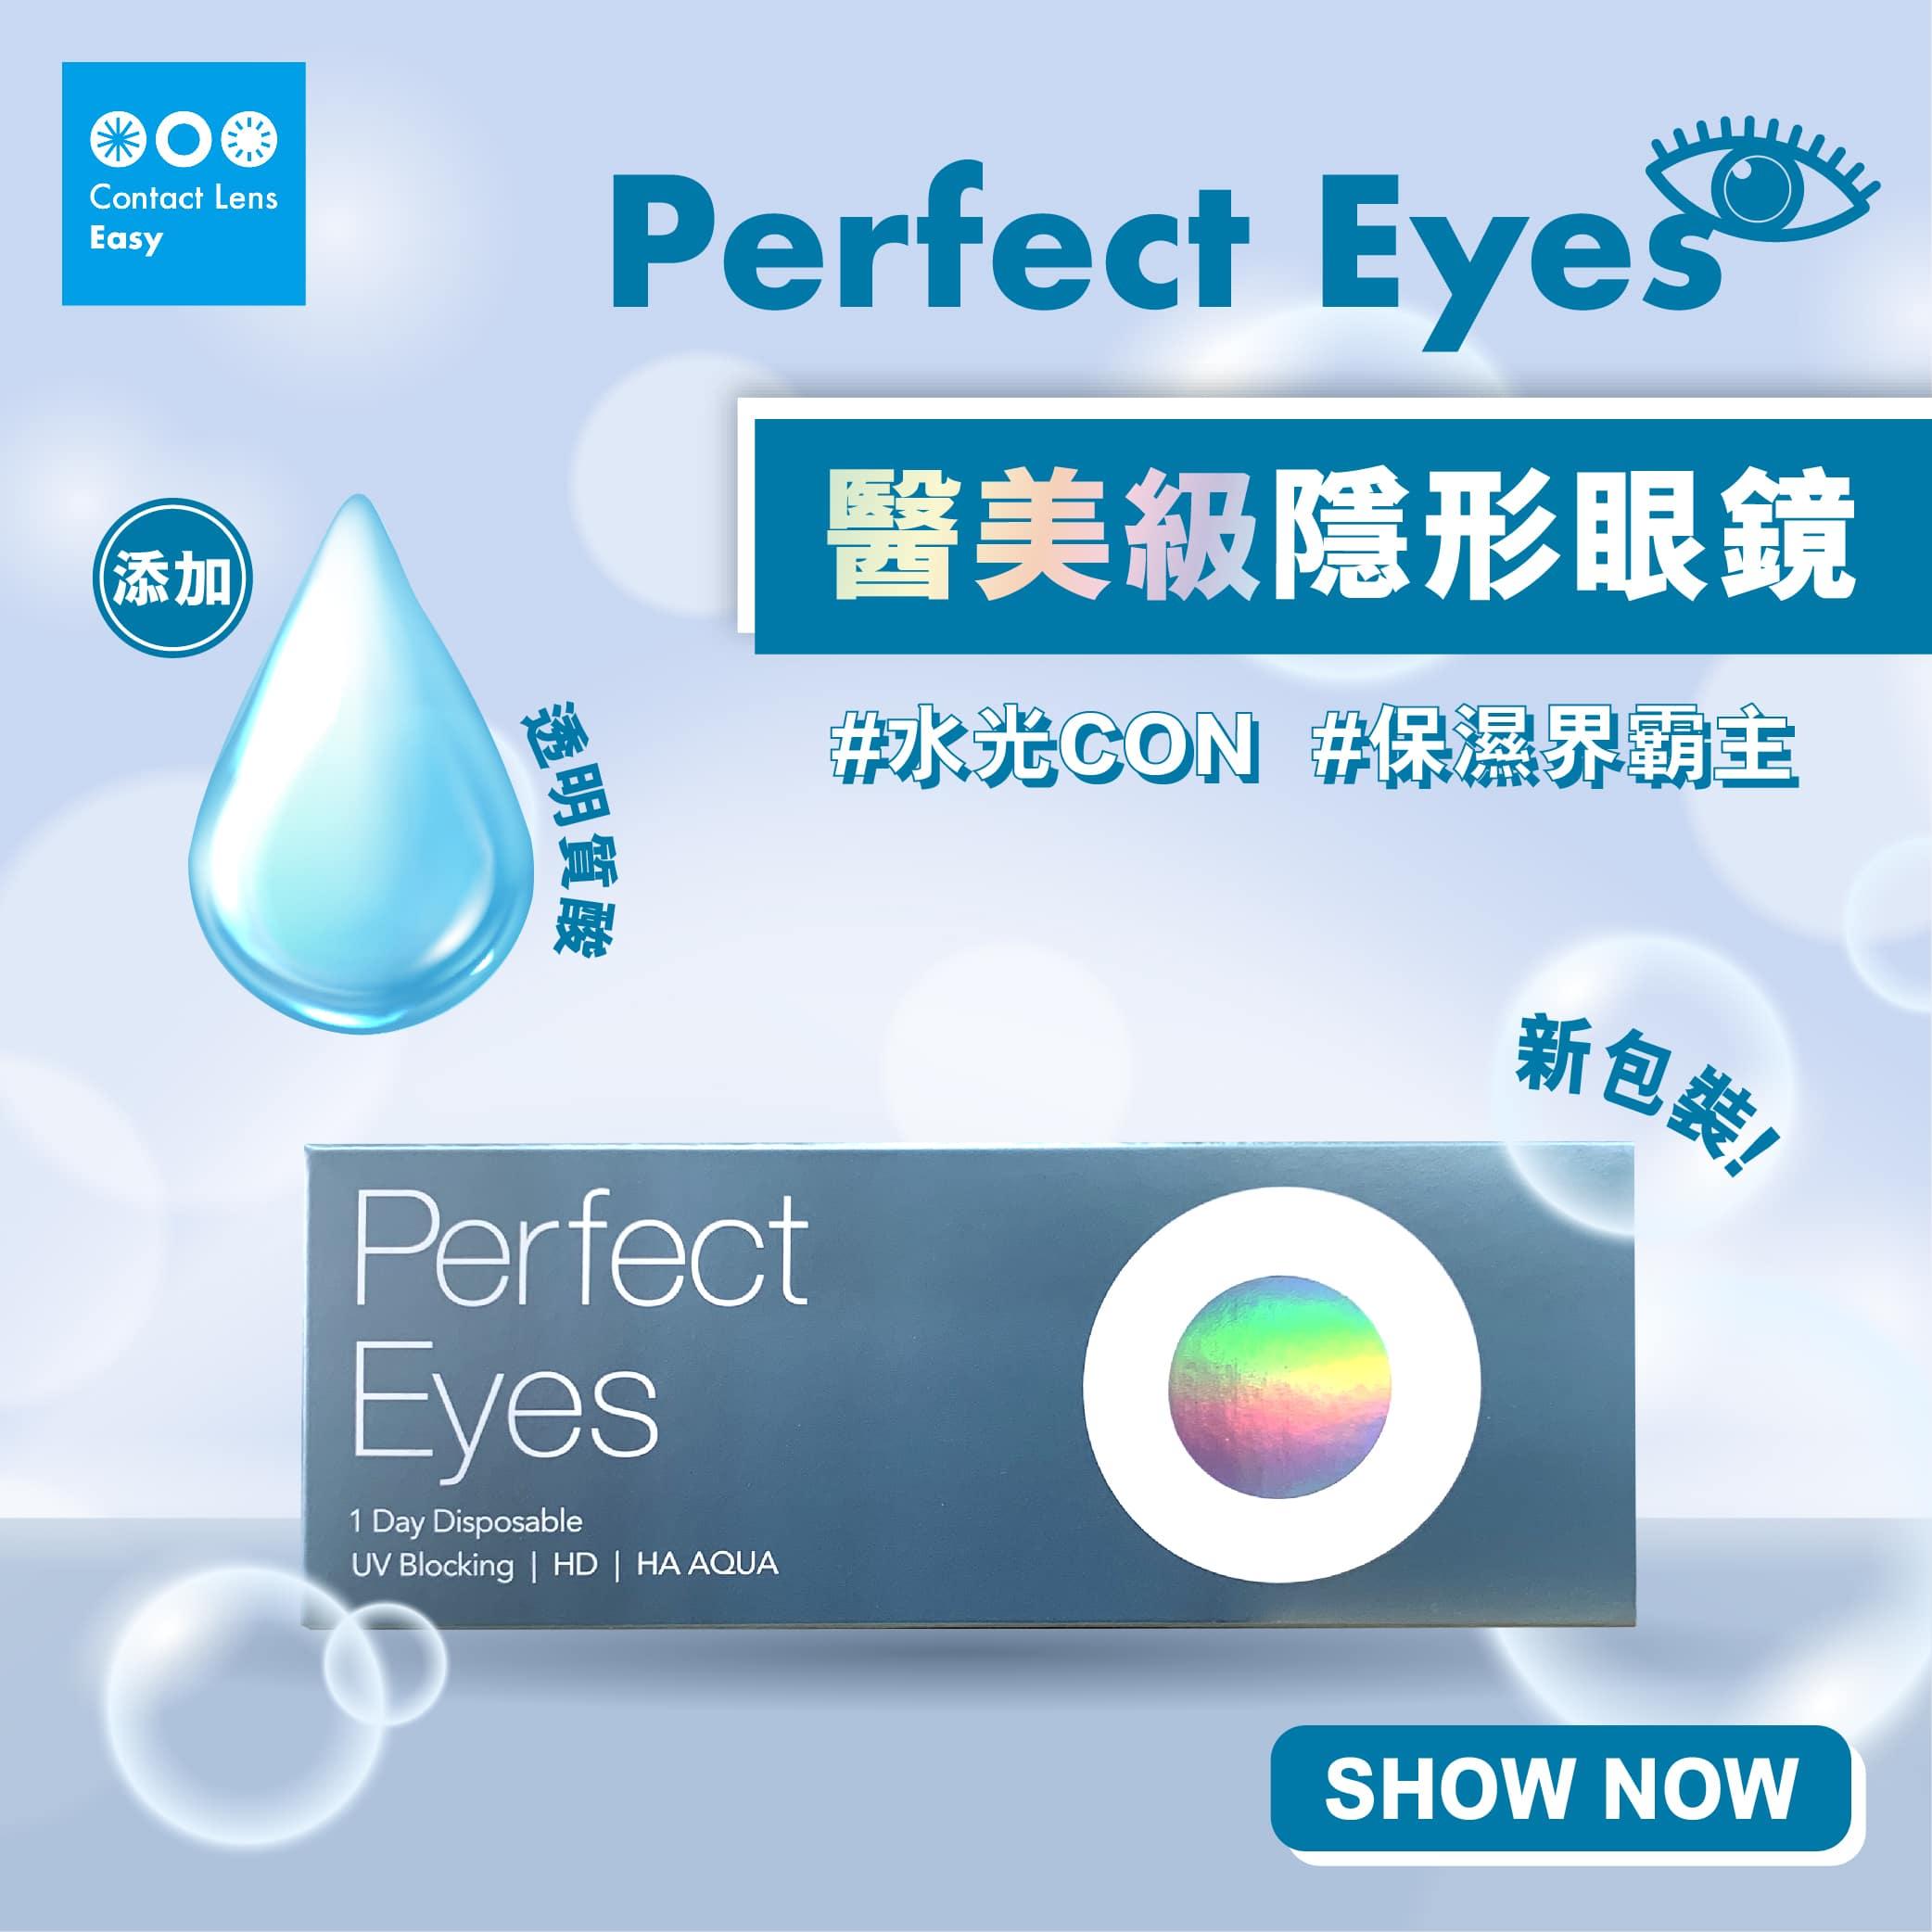 Perfect Eyes 1 Day 每日即棄隱形眼鏡